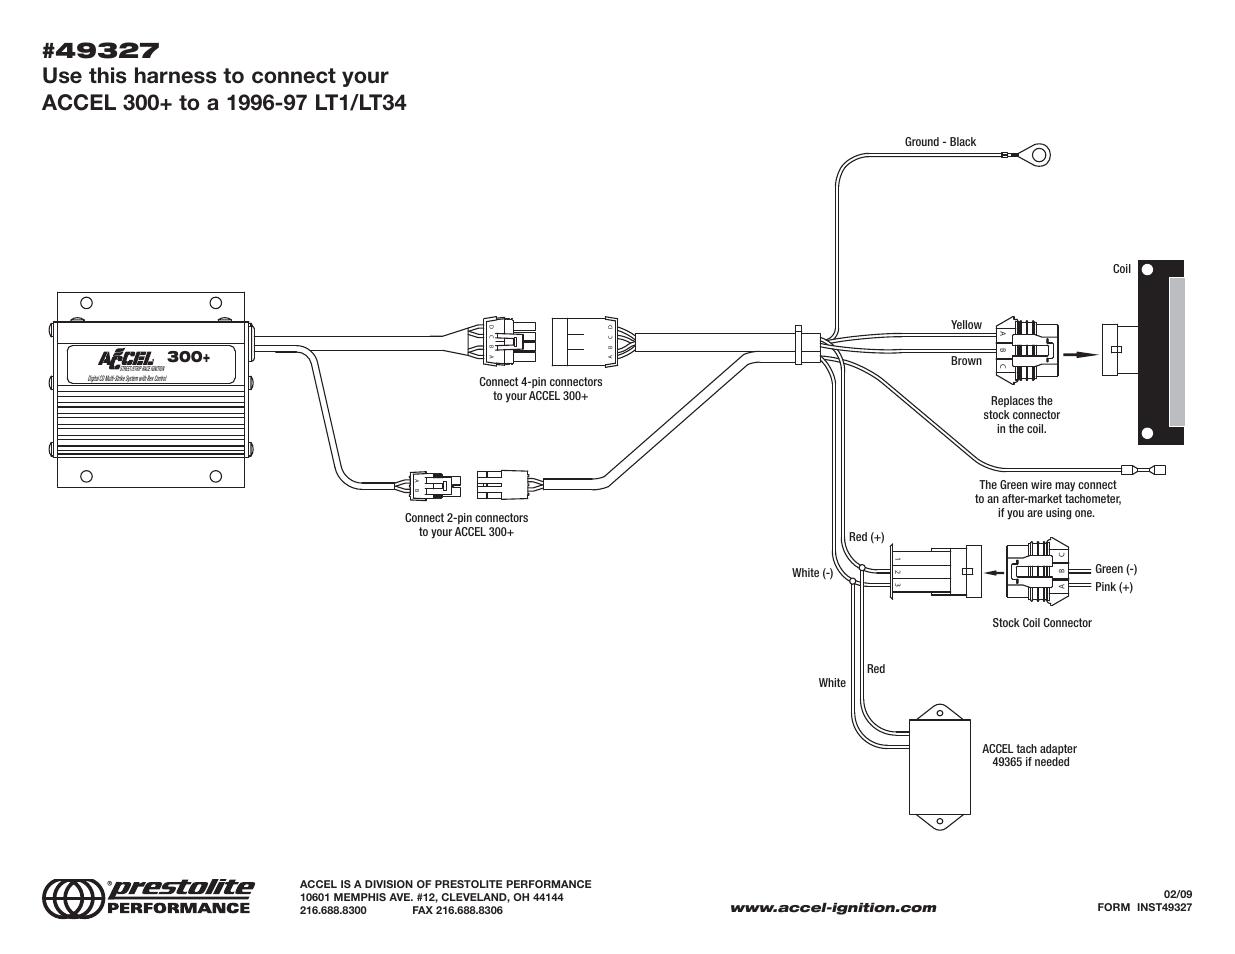 Subaru Wrx Ignition Switch Wiring Diagram Along With Subaru Wrx Wiring